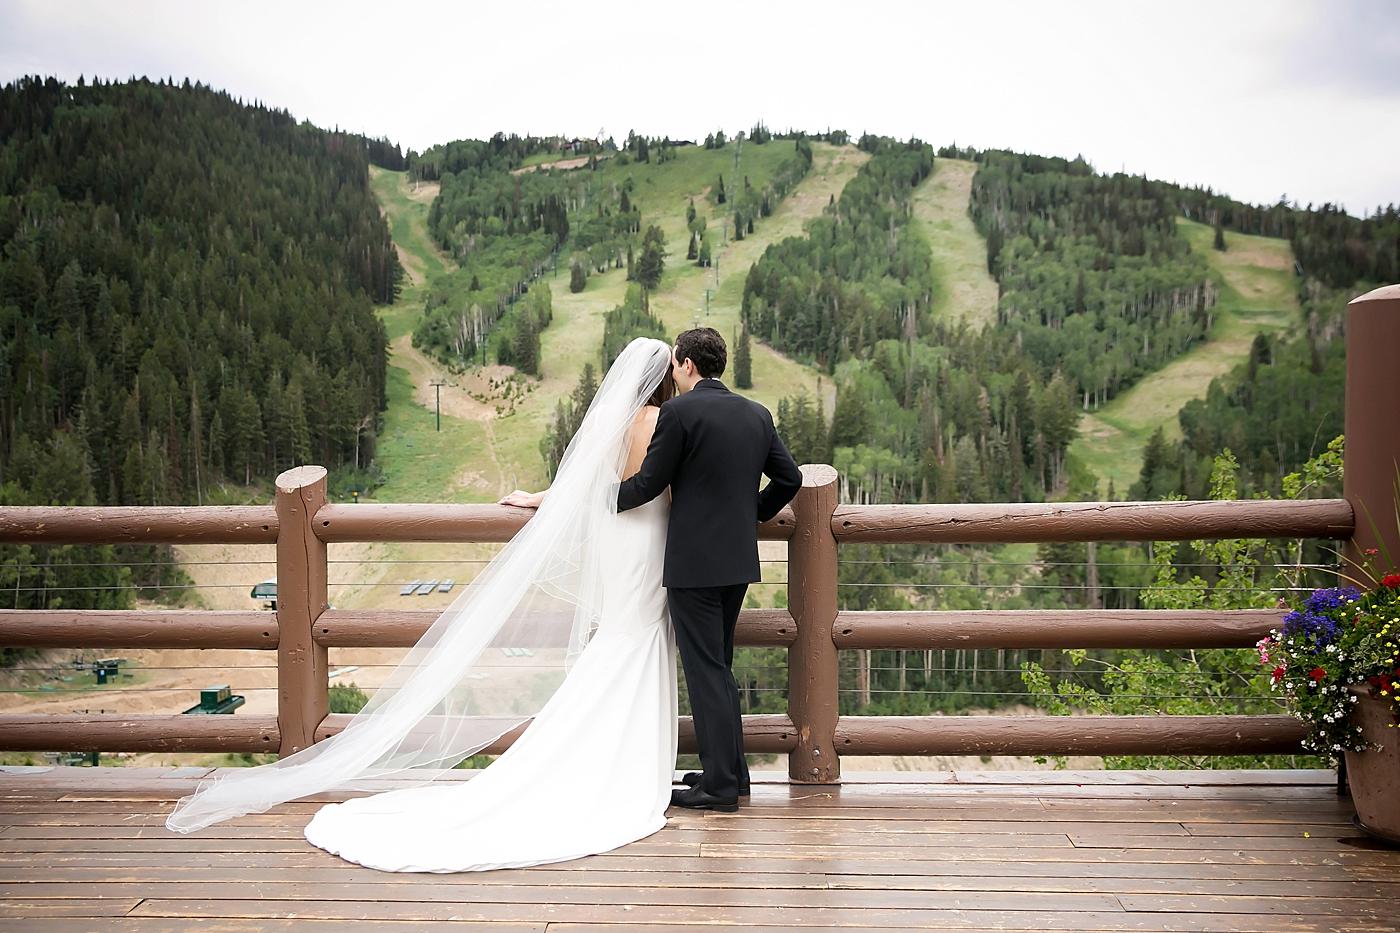 Romantic Mountain Wedding_Deer Valley Weddings_Park City Wedding Planner_MelissaFancy_0078.jpg